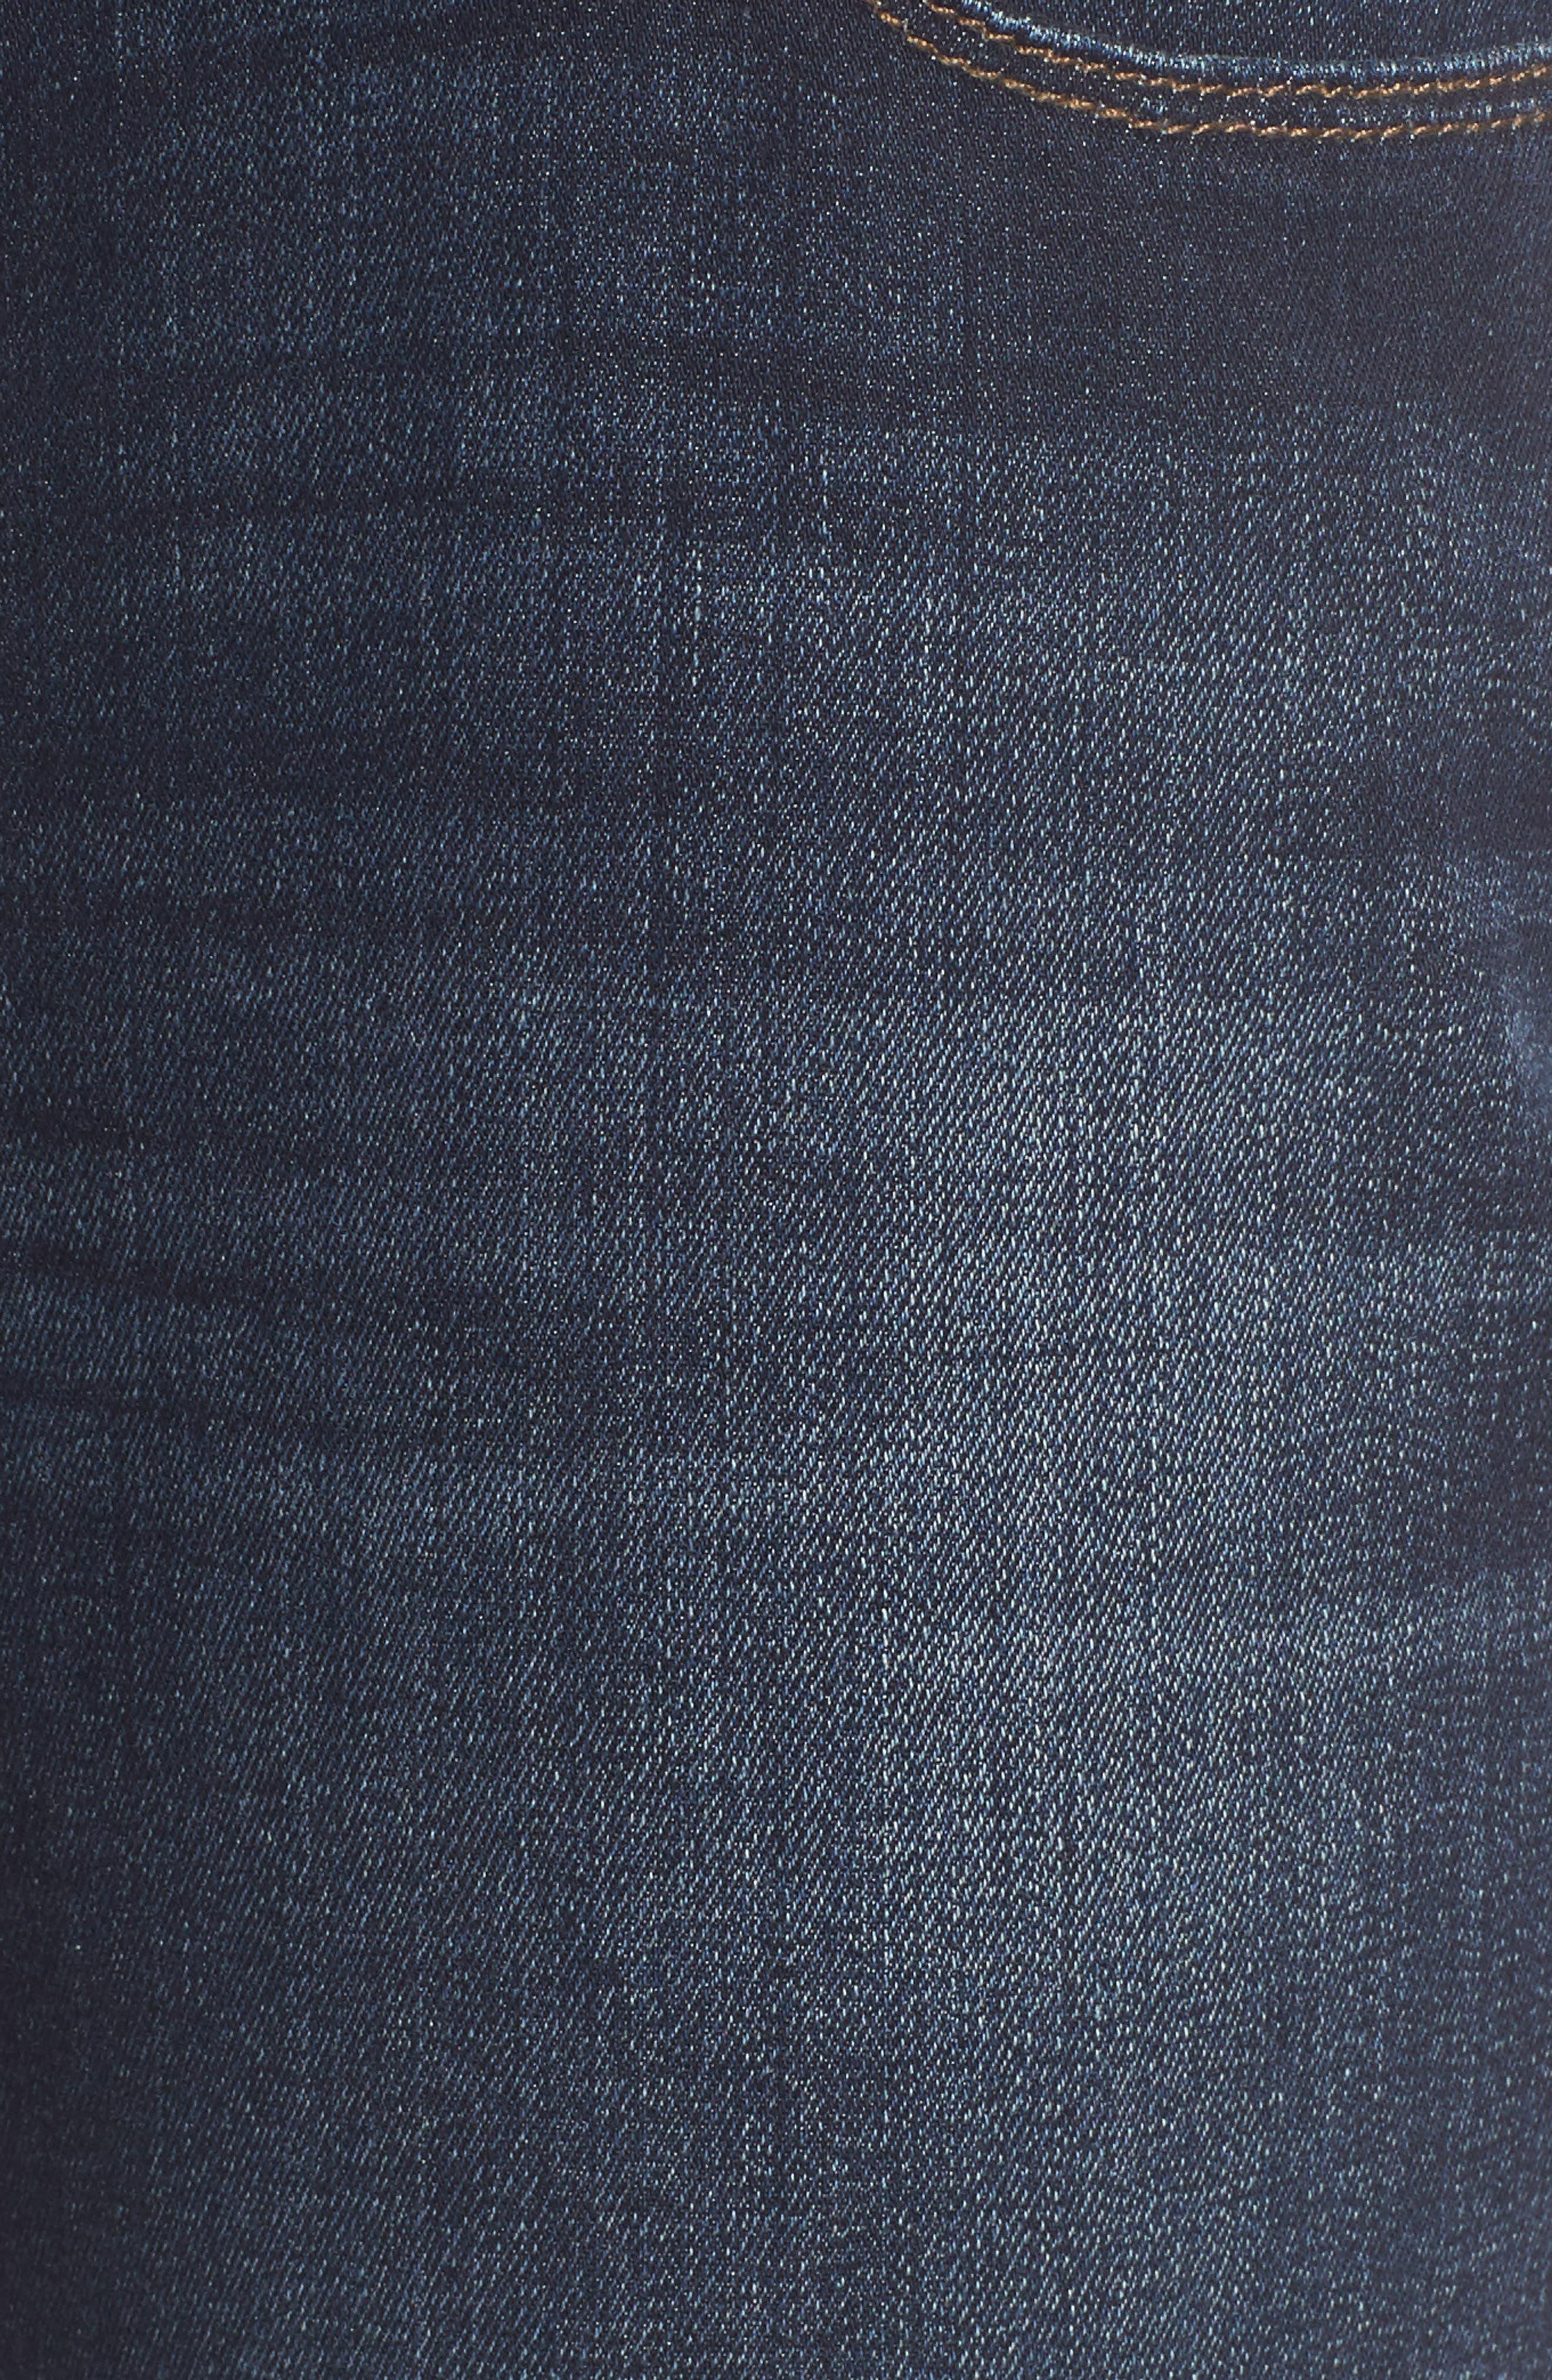 Ada Boyfriend Jeans,                             Alternate thumbnail 6, color,                             INDIGO BRUSHED